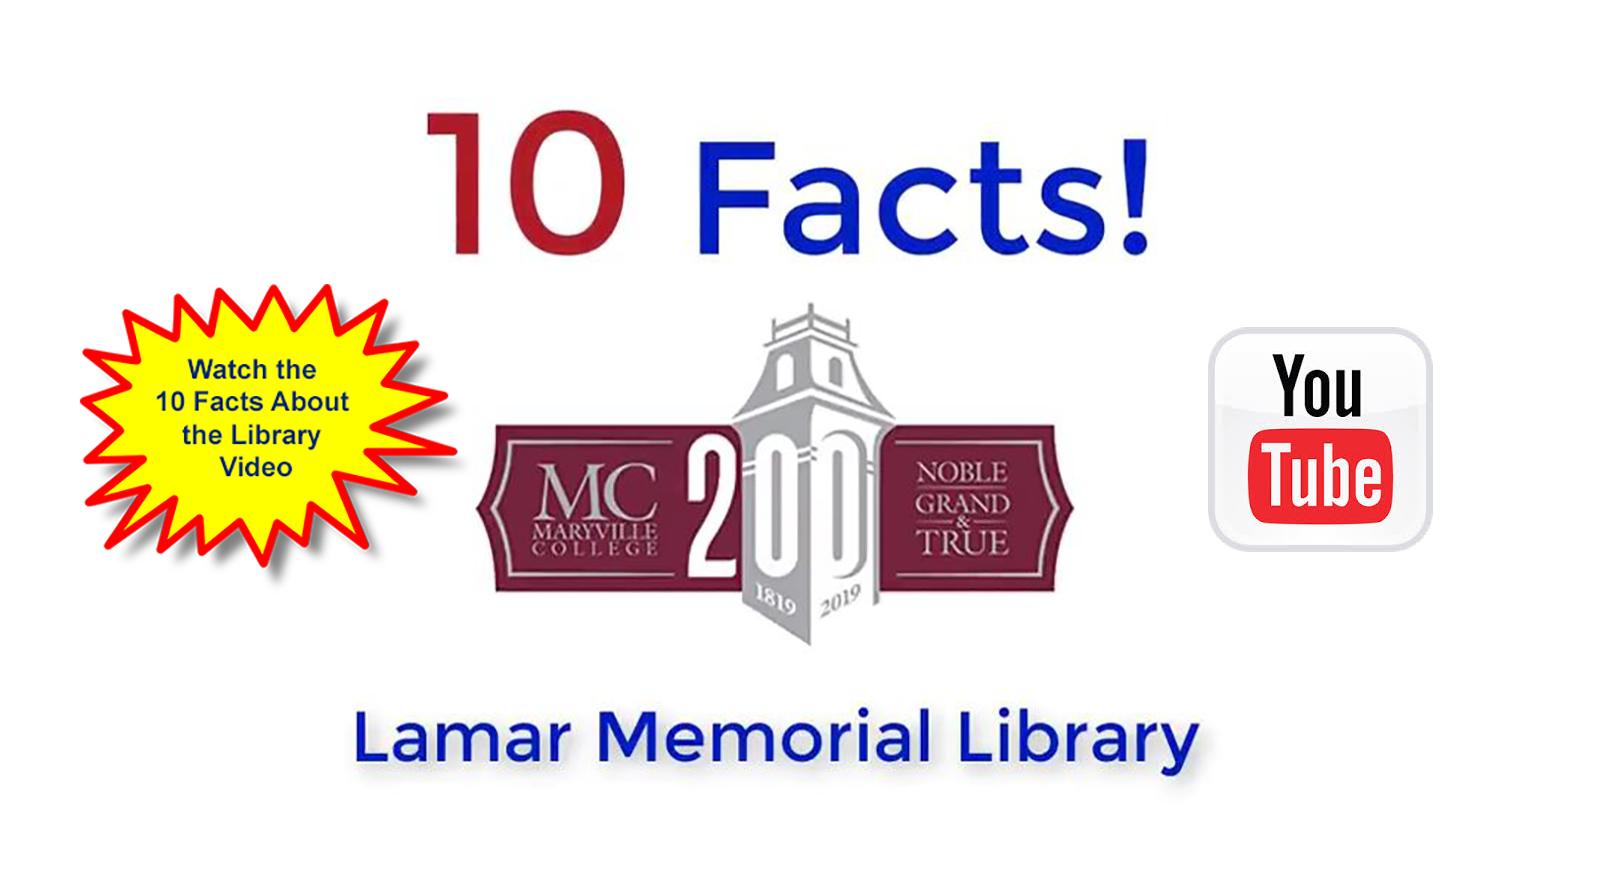 ten facts video